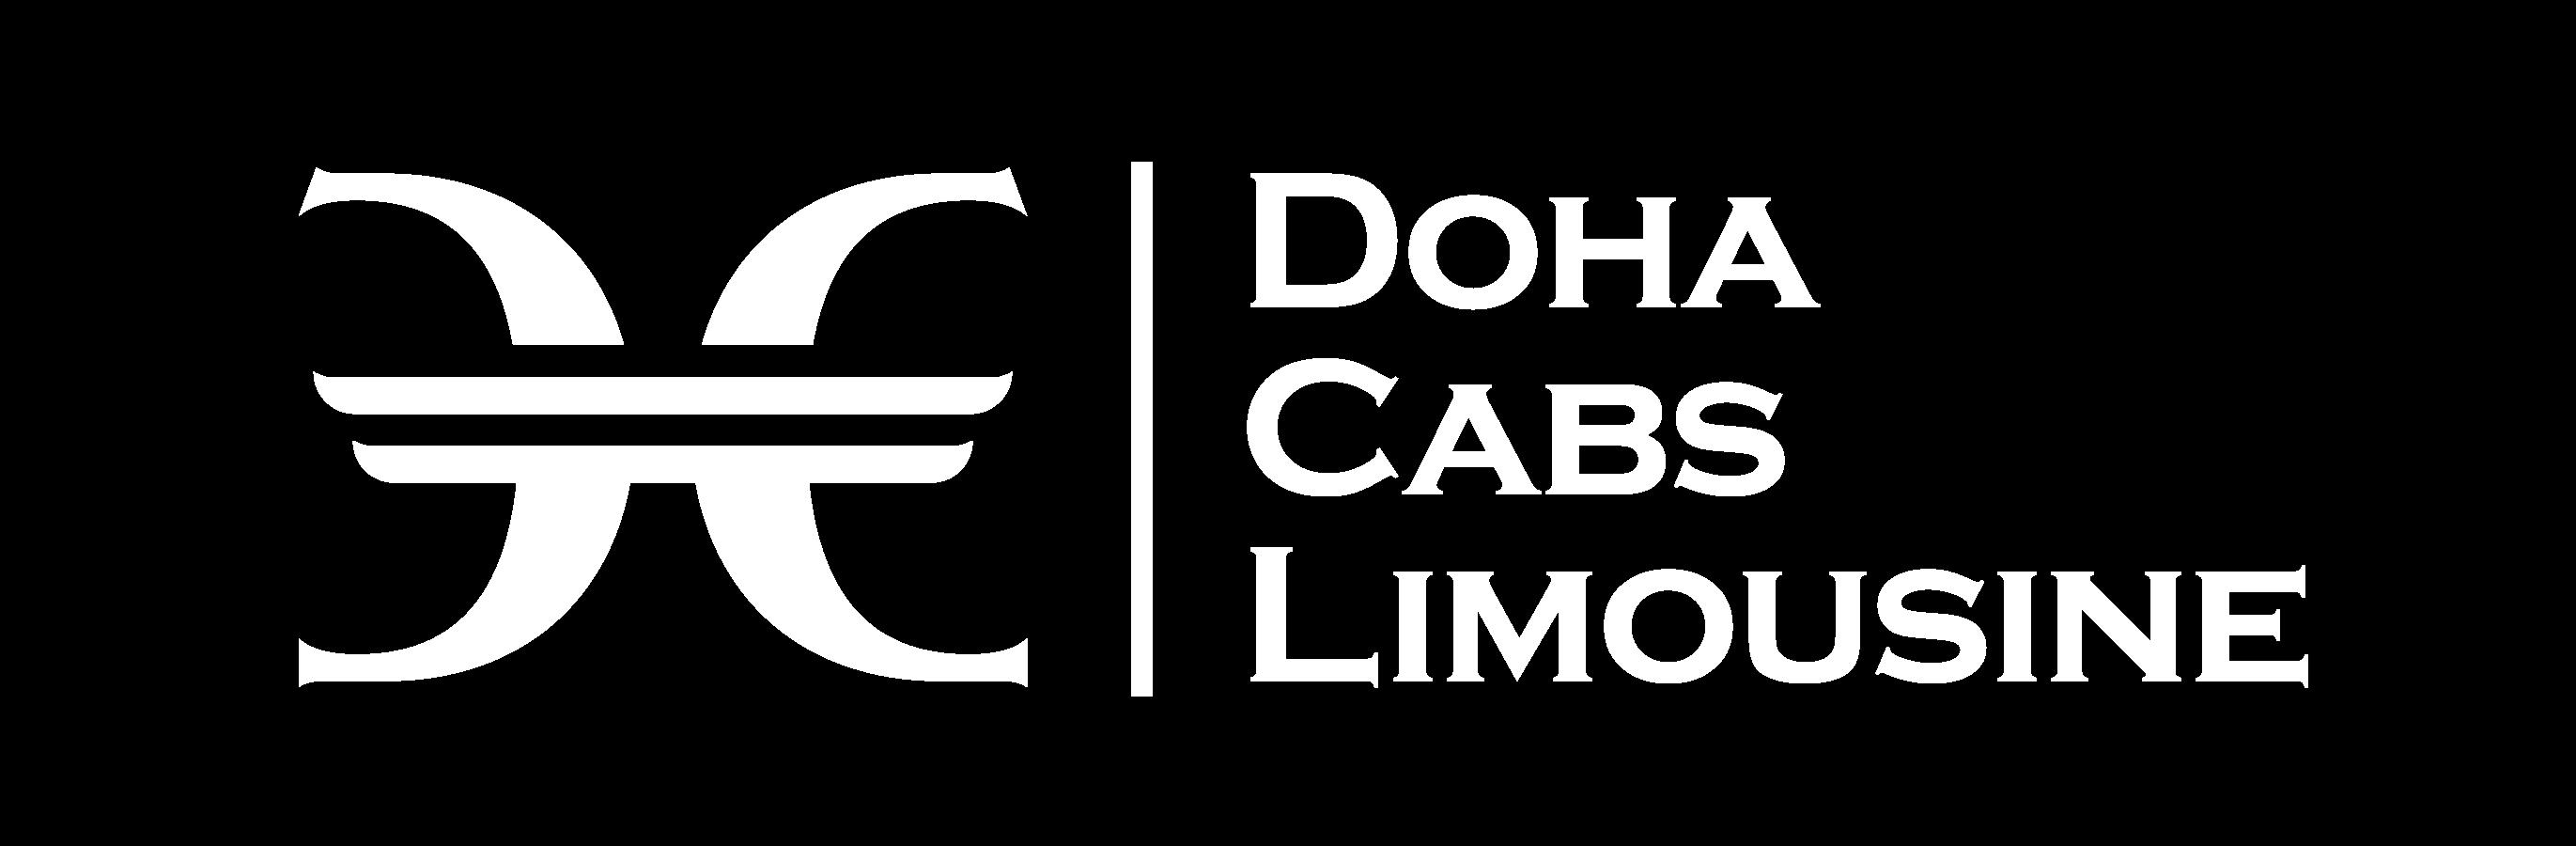 Doha Cabs Limousine